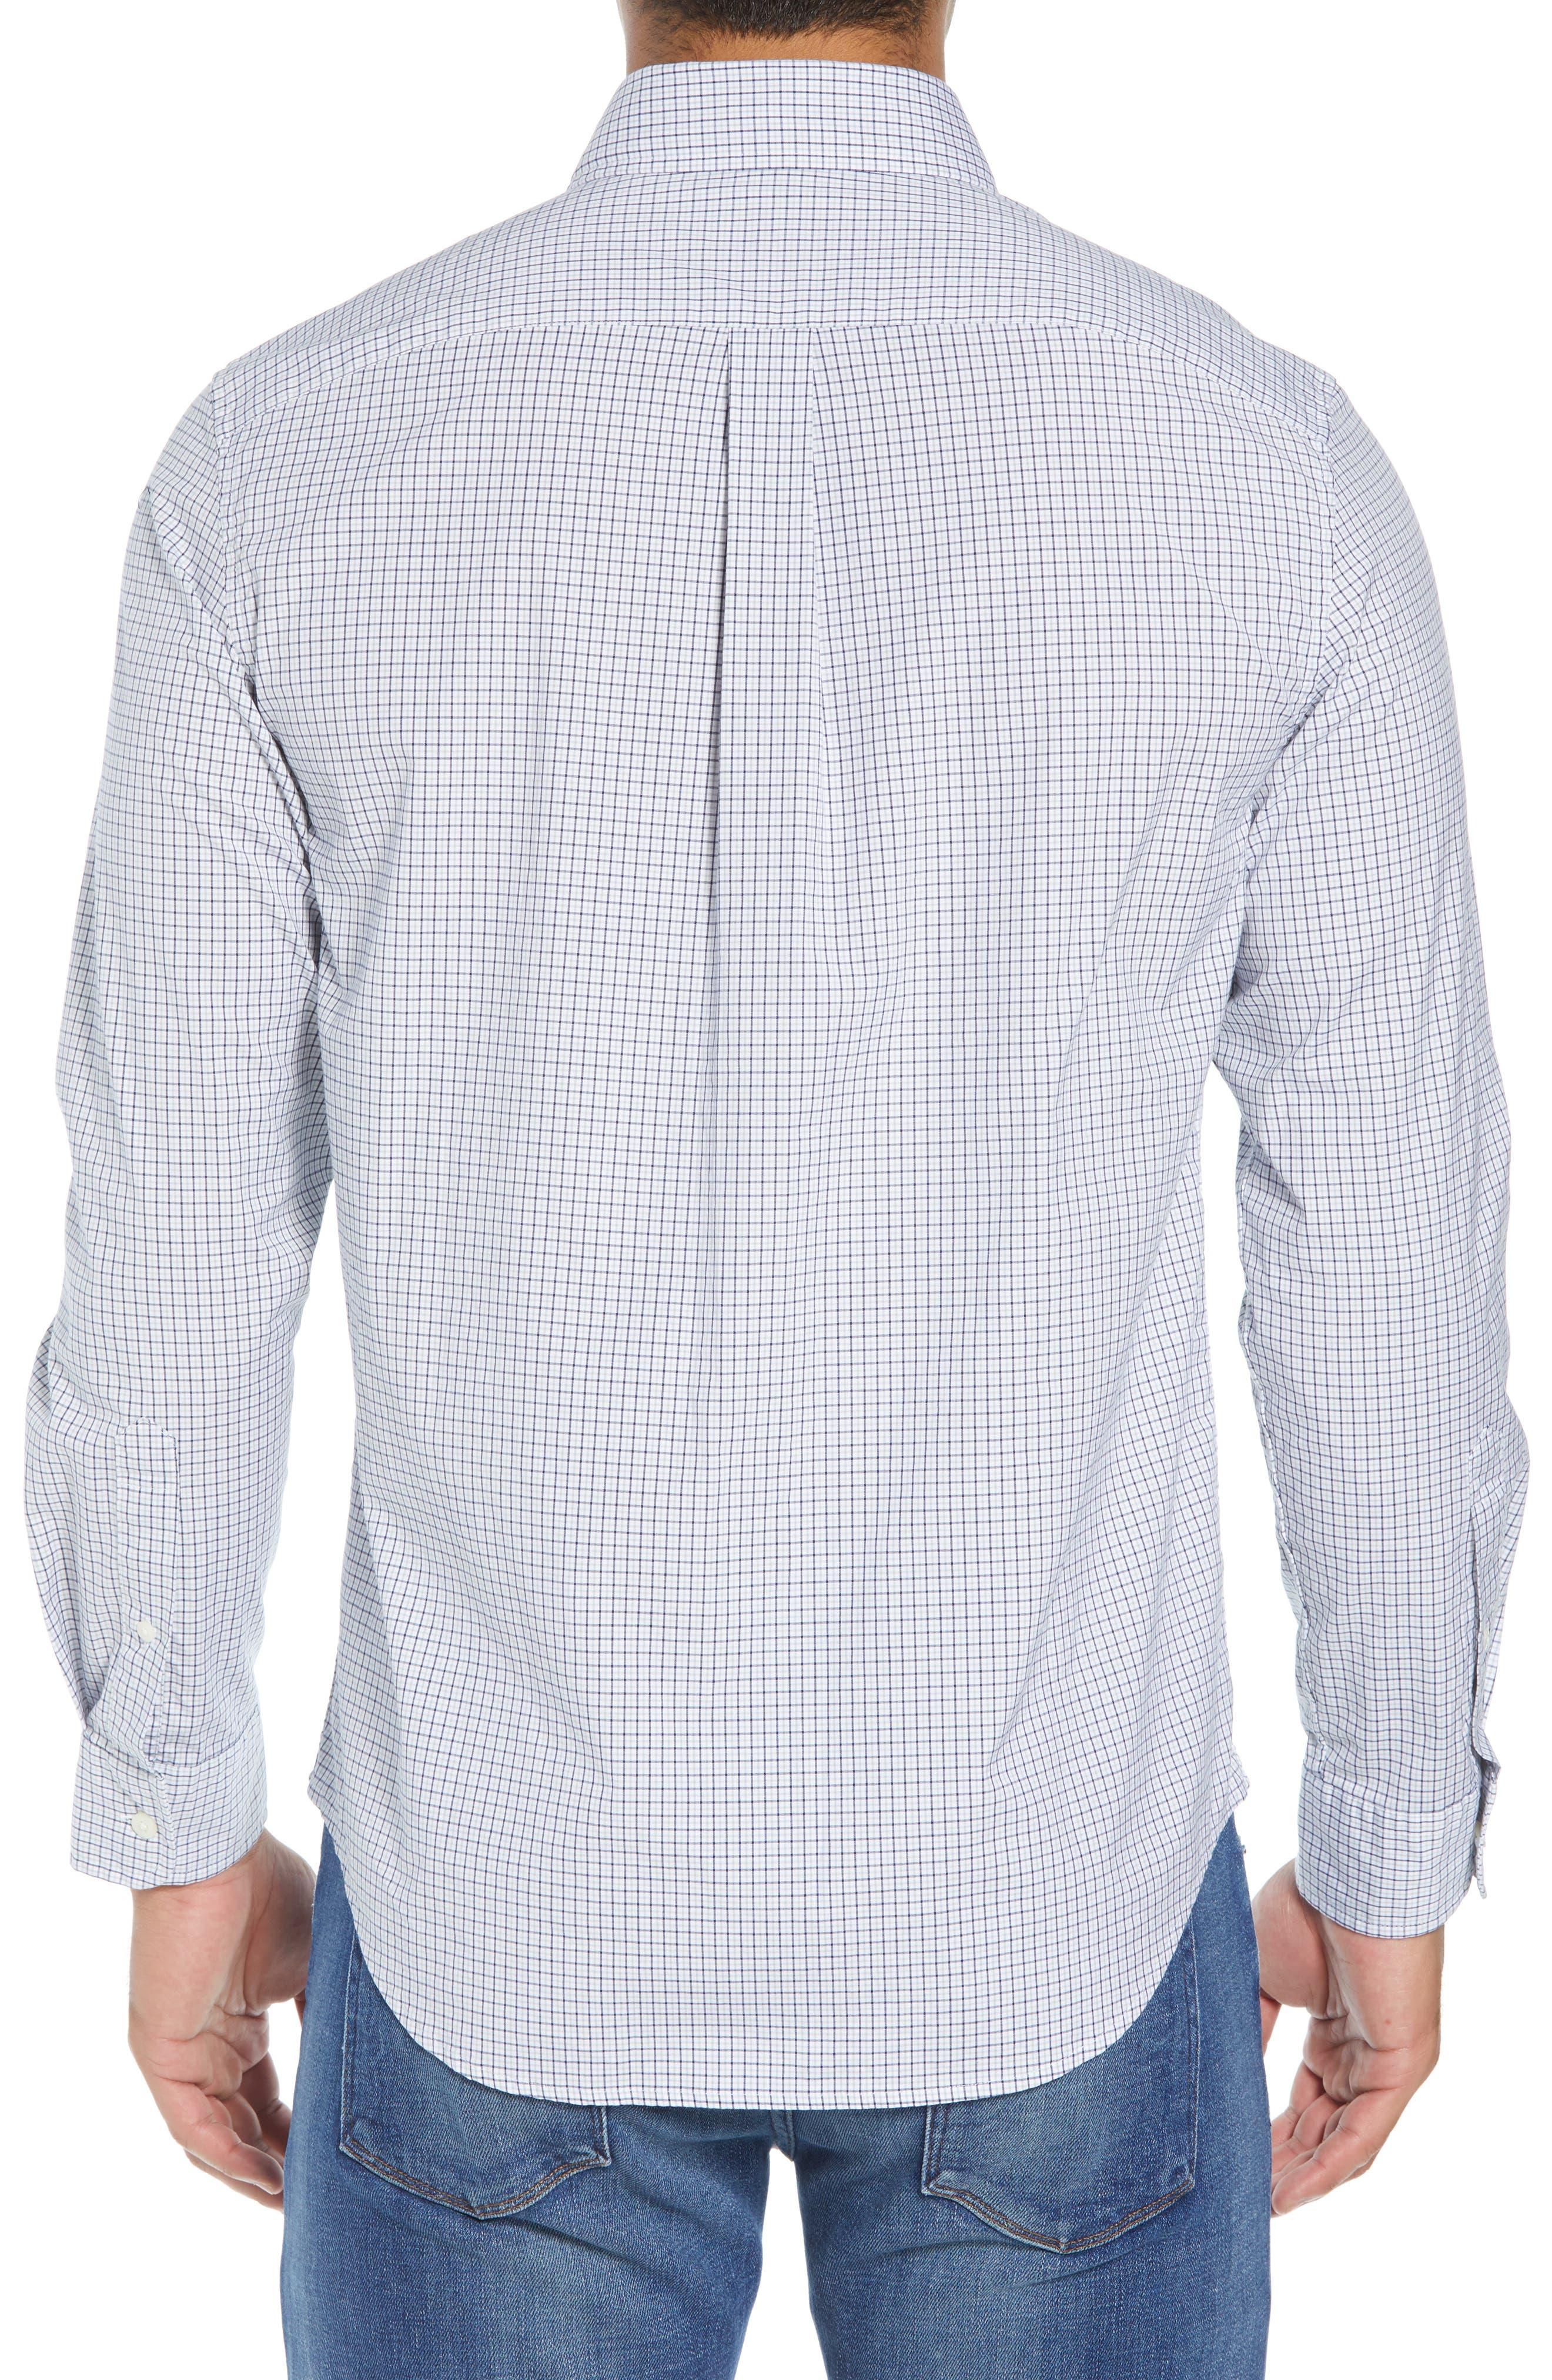 Beechcroft Regular Fit Check Sport Shirt,                             Alternate thumbnail 3, color,                             034